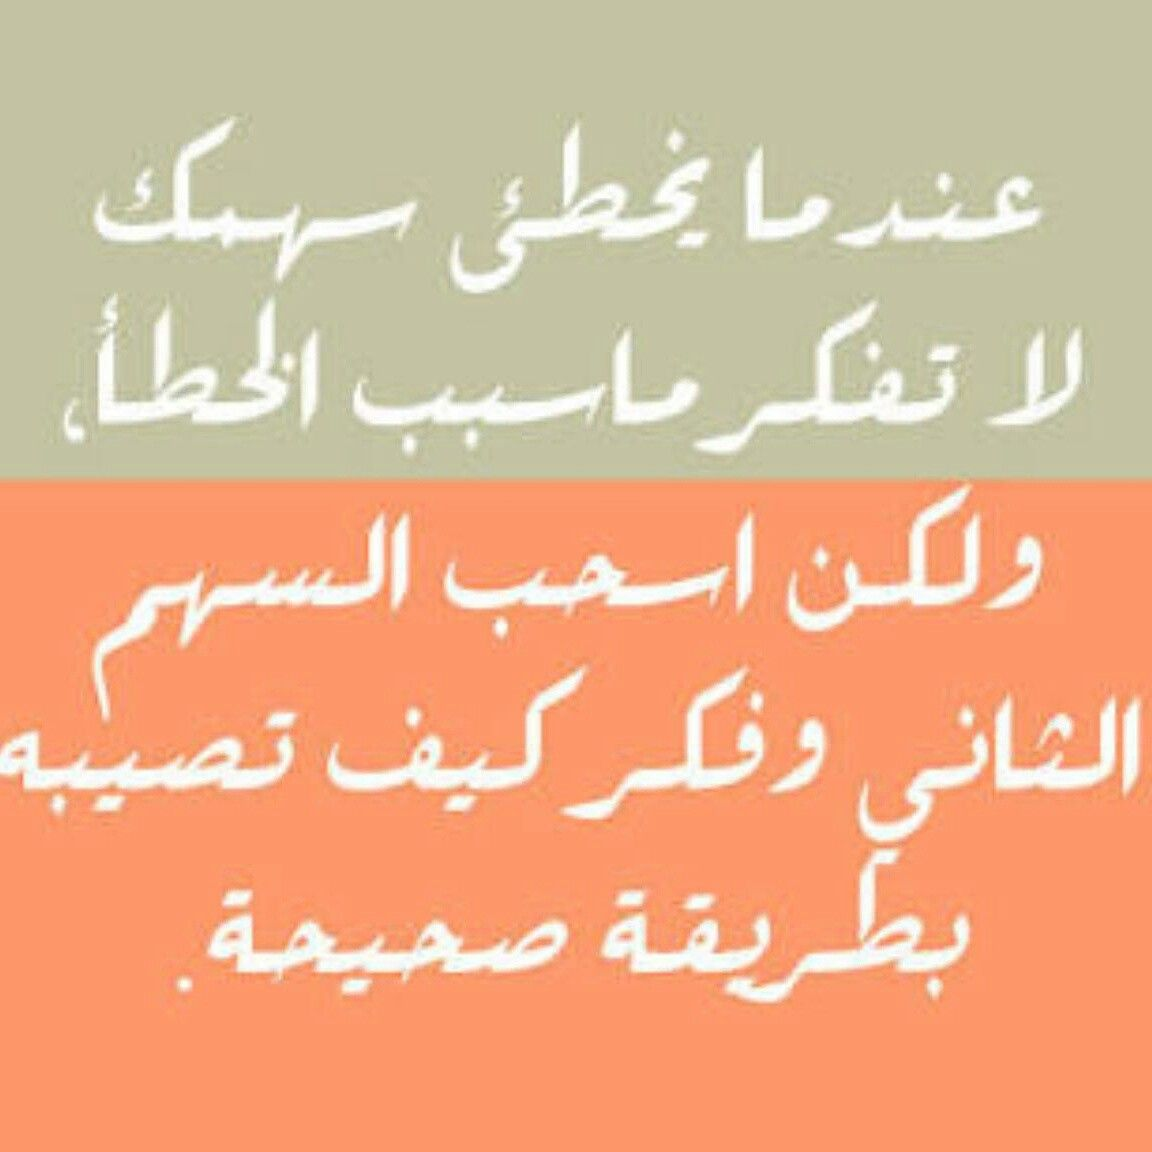 Pin By Farabi School On Farabi Language School Motivational Sticker Motivation Stickers